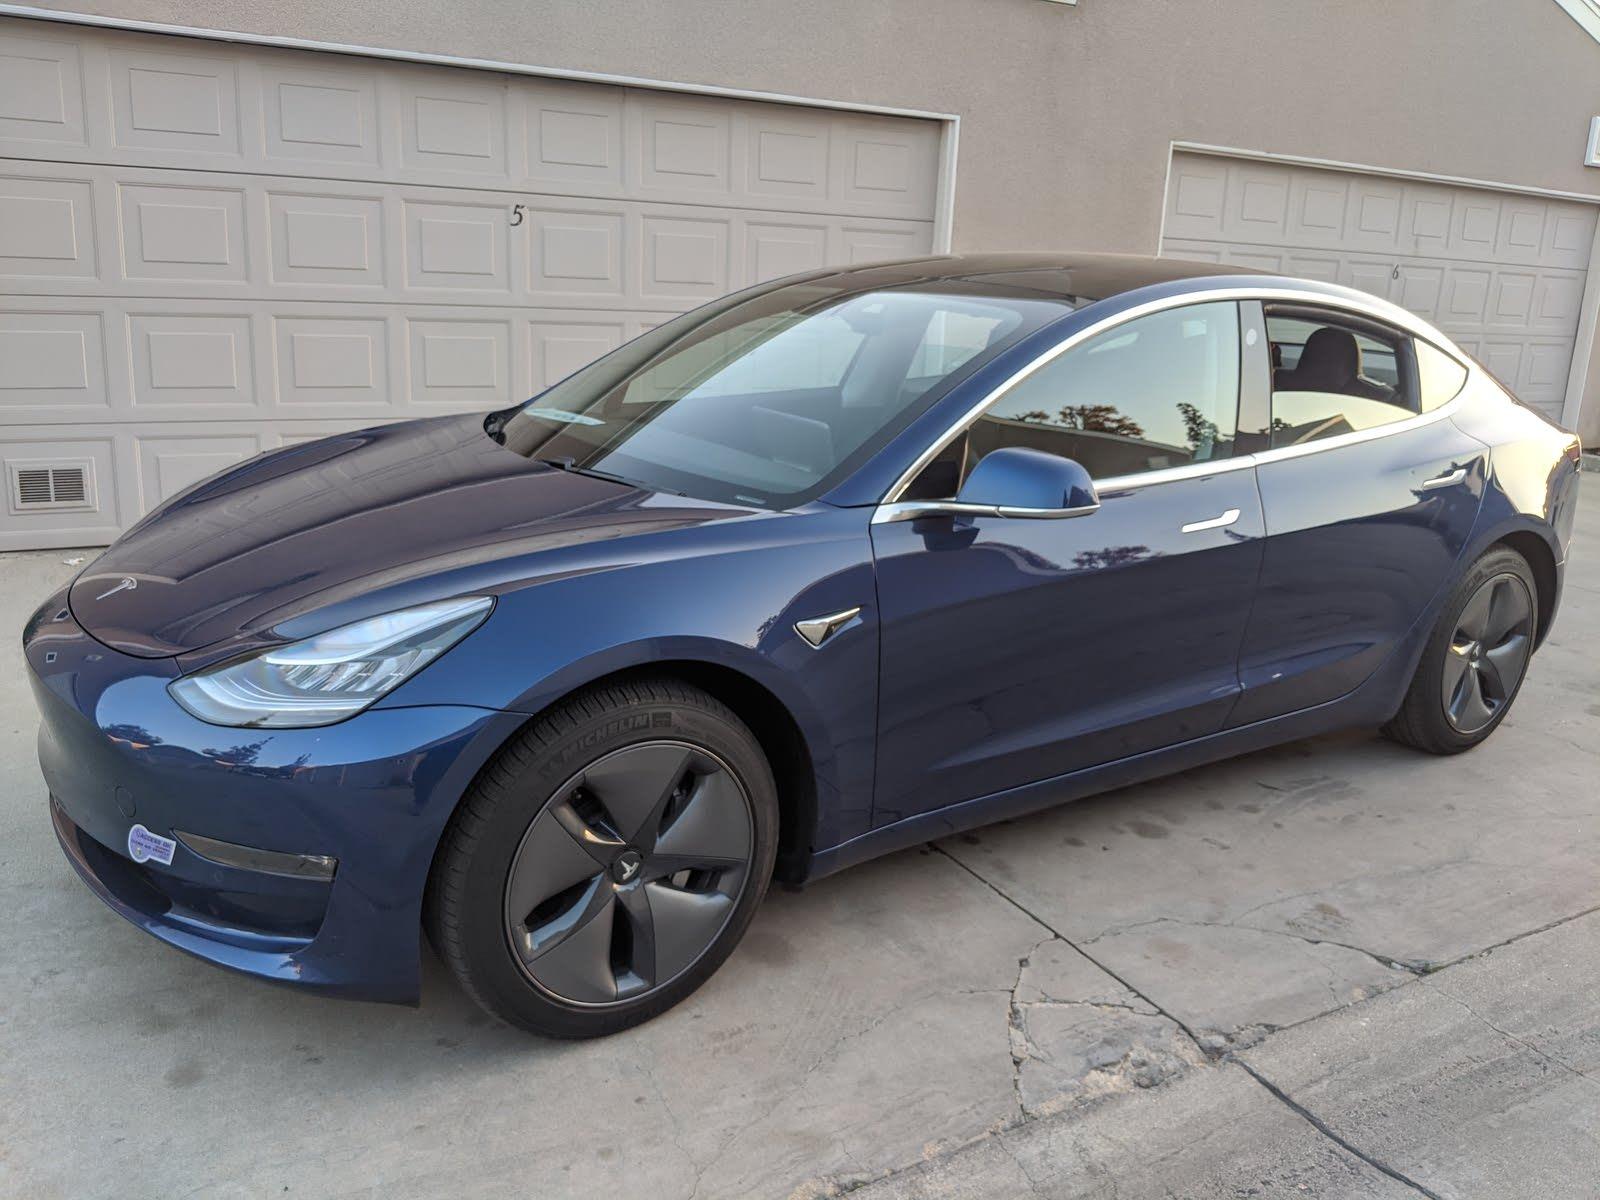 Used 2019 Tesla Model 3 for Sale (with Dealer Reviews ...